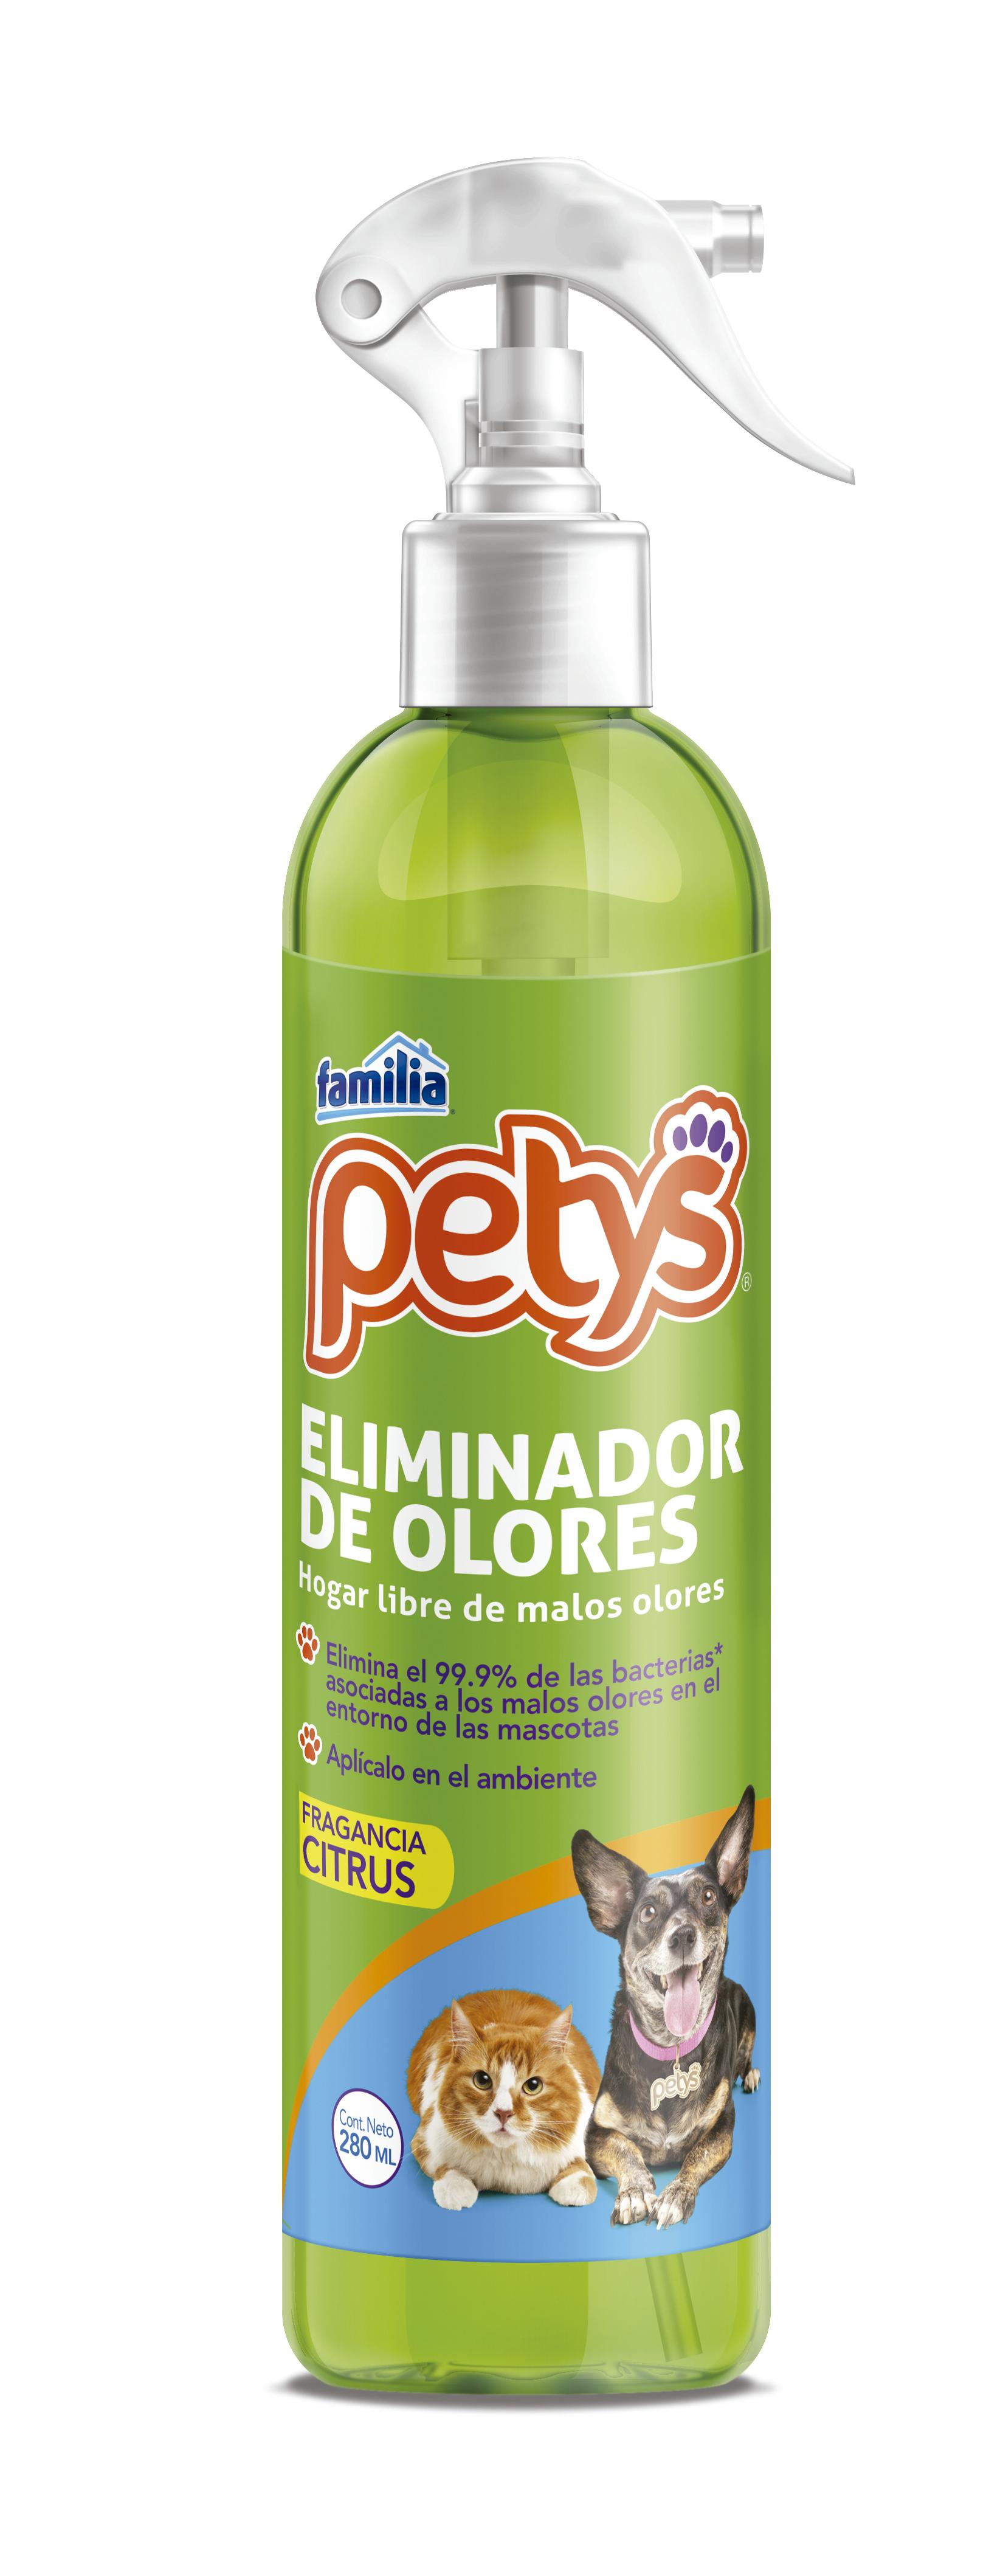 Eliminador de Olores Petys X280ml